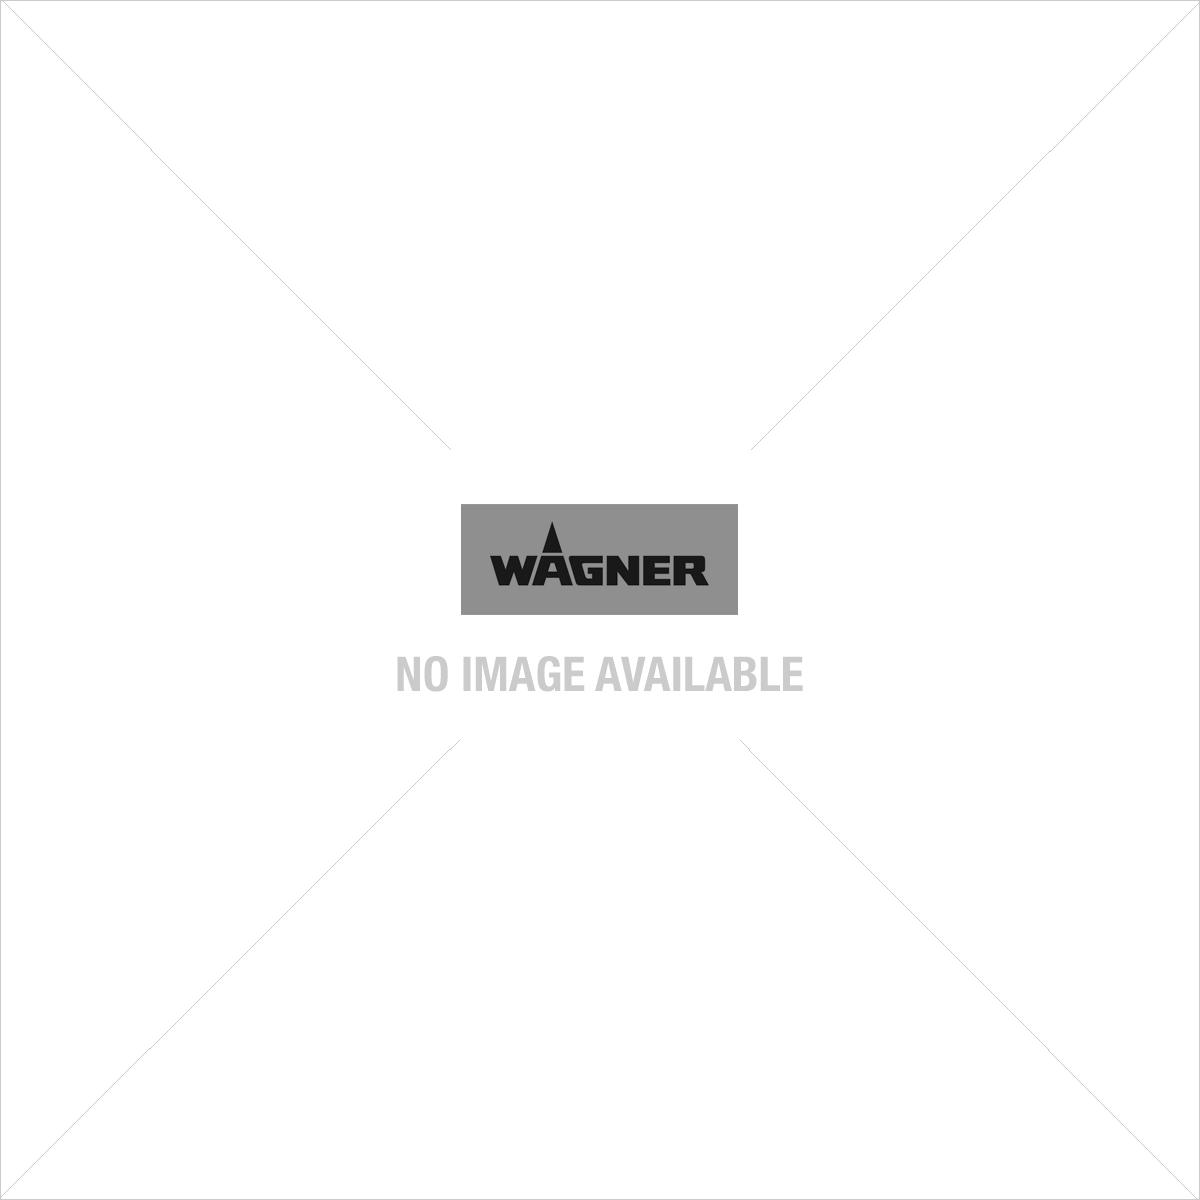 W550 Wagner peinture